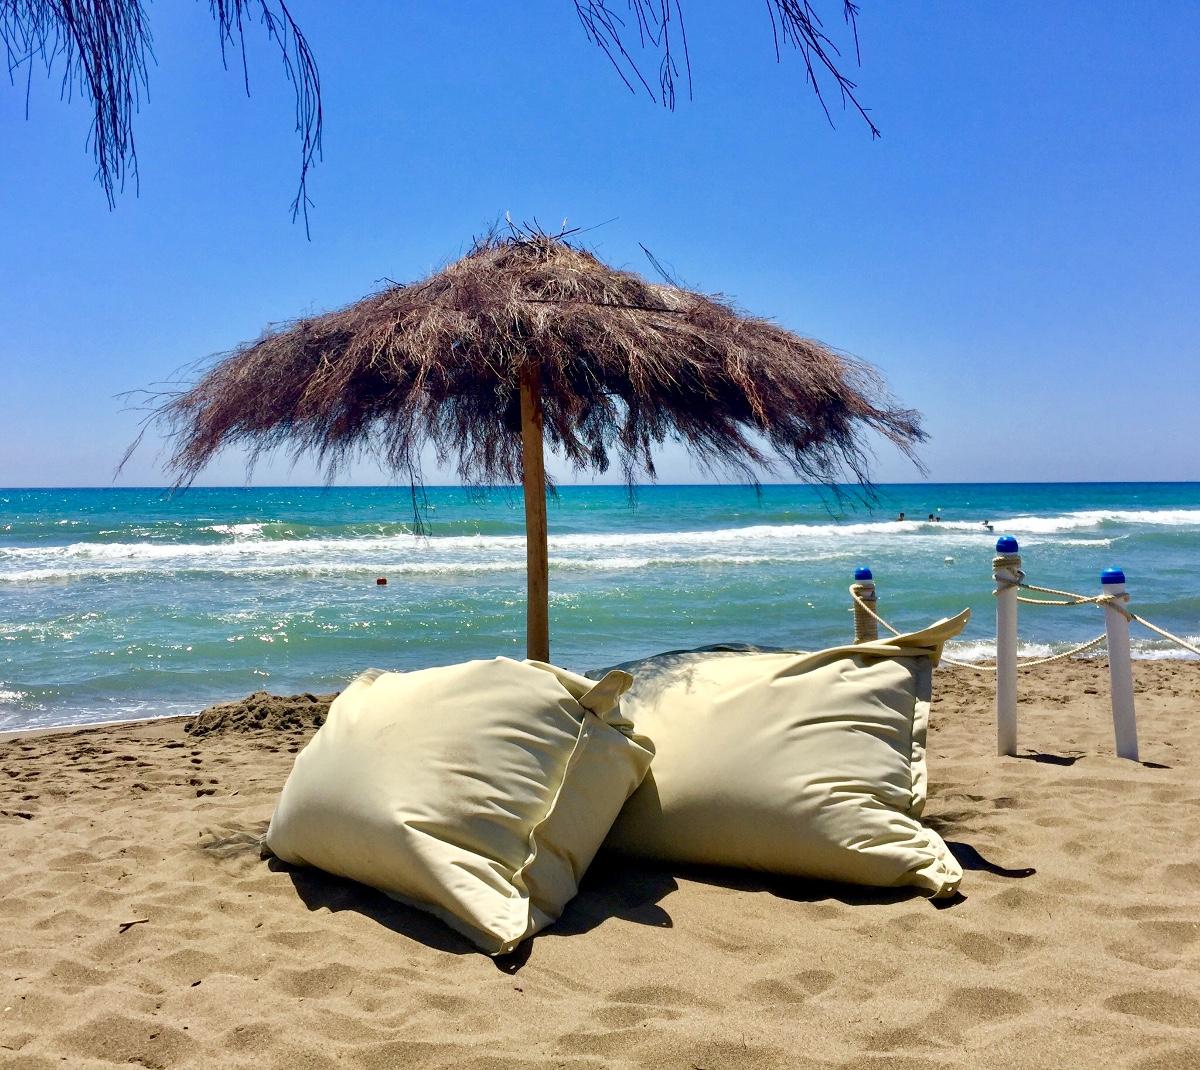 Spiaggia attrezzata beach relax - Camping Village Maremma Sanssouci